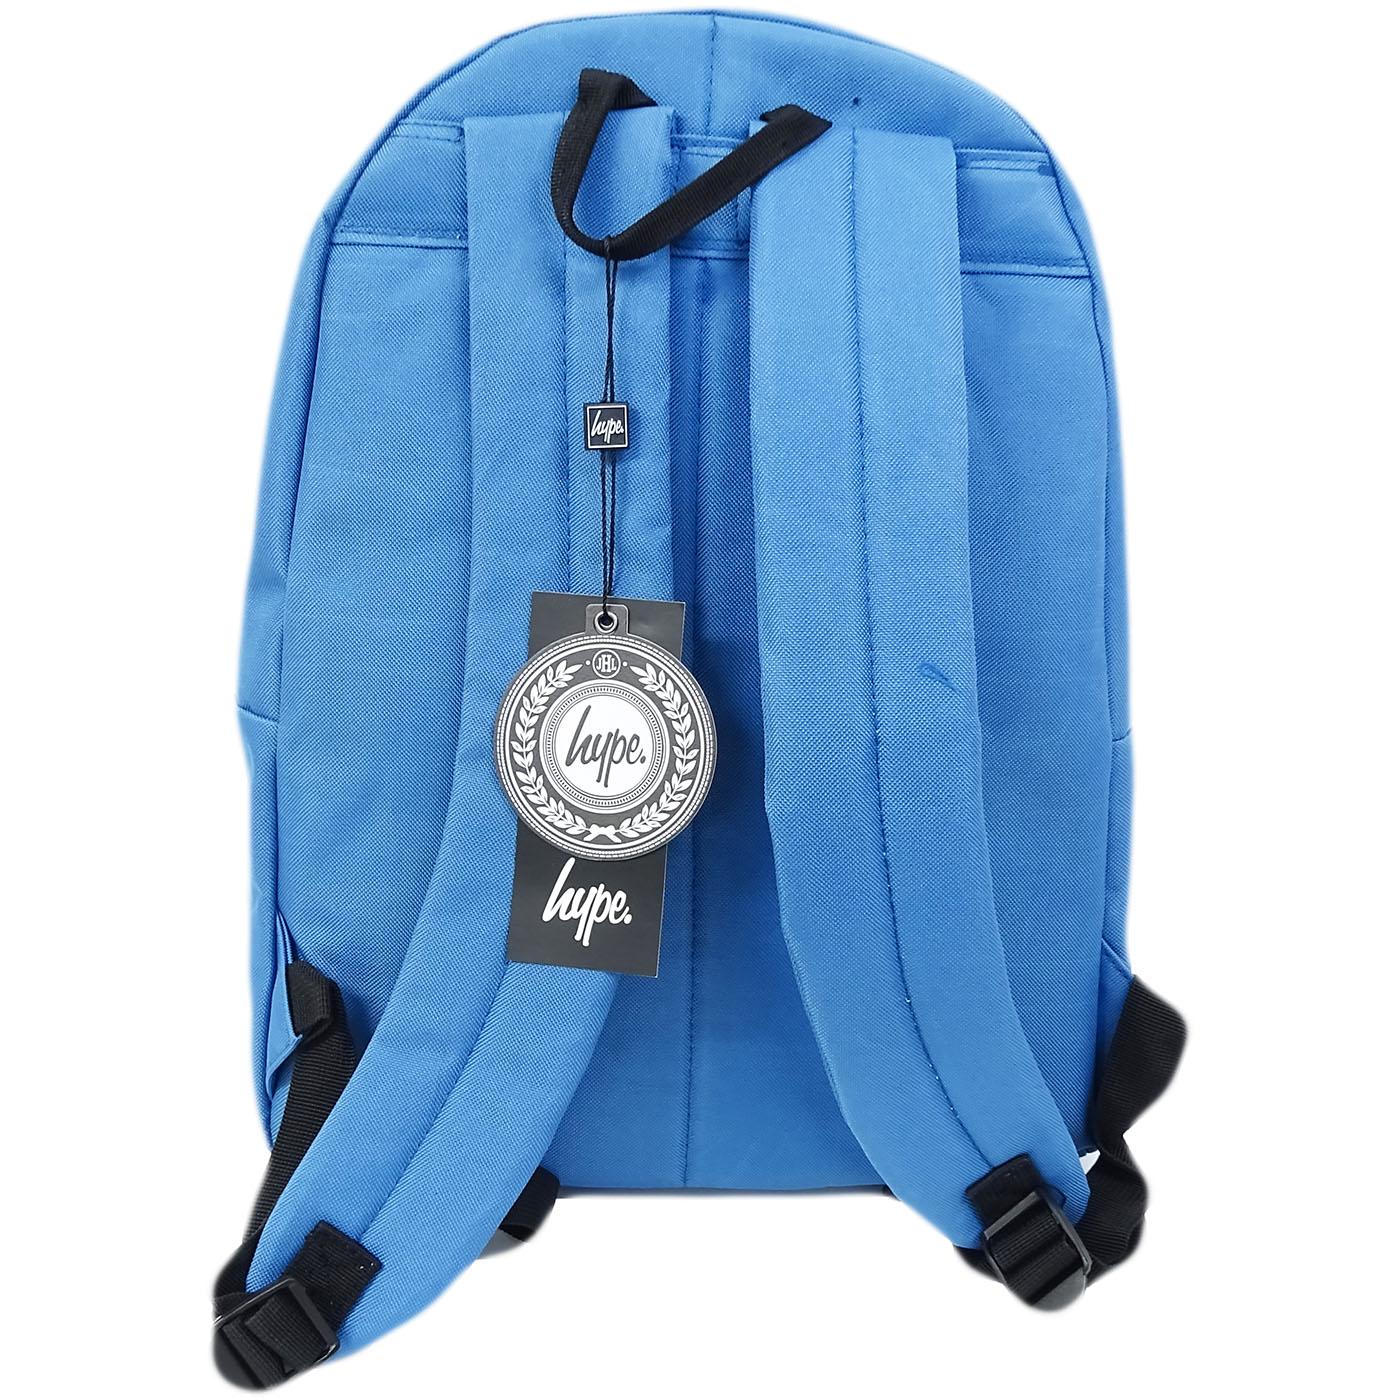 Boys Girls Hype Plain Blue Rucksack Backpack Bag 5056120646630 05779726392a1